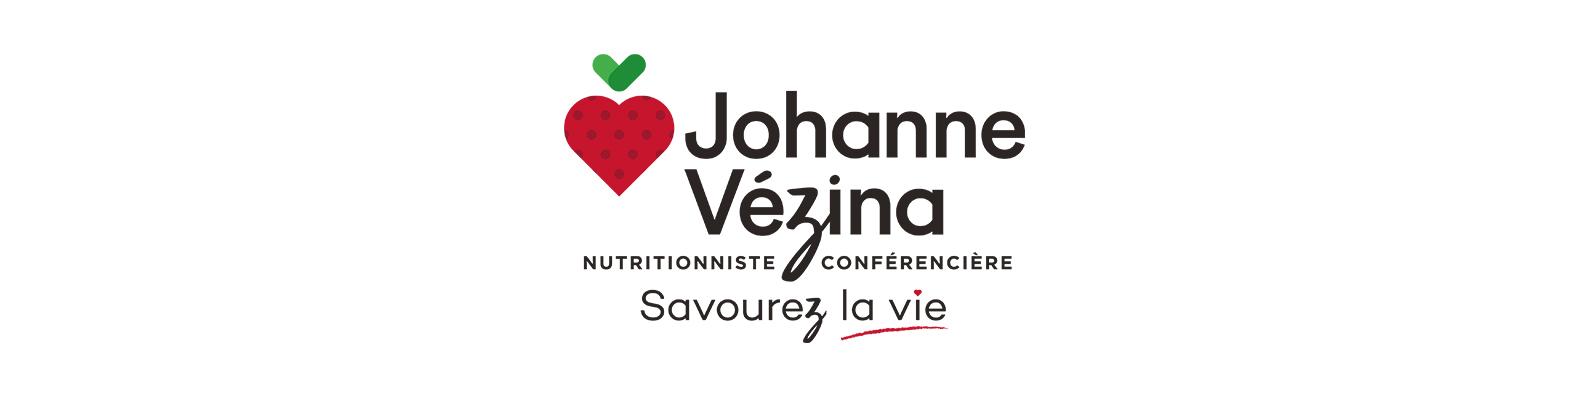 Équipe Nutrition Préventive Johanne Vézina